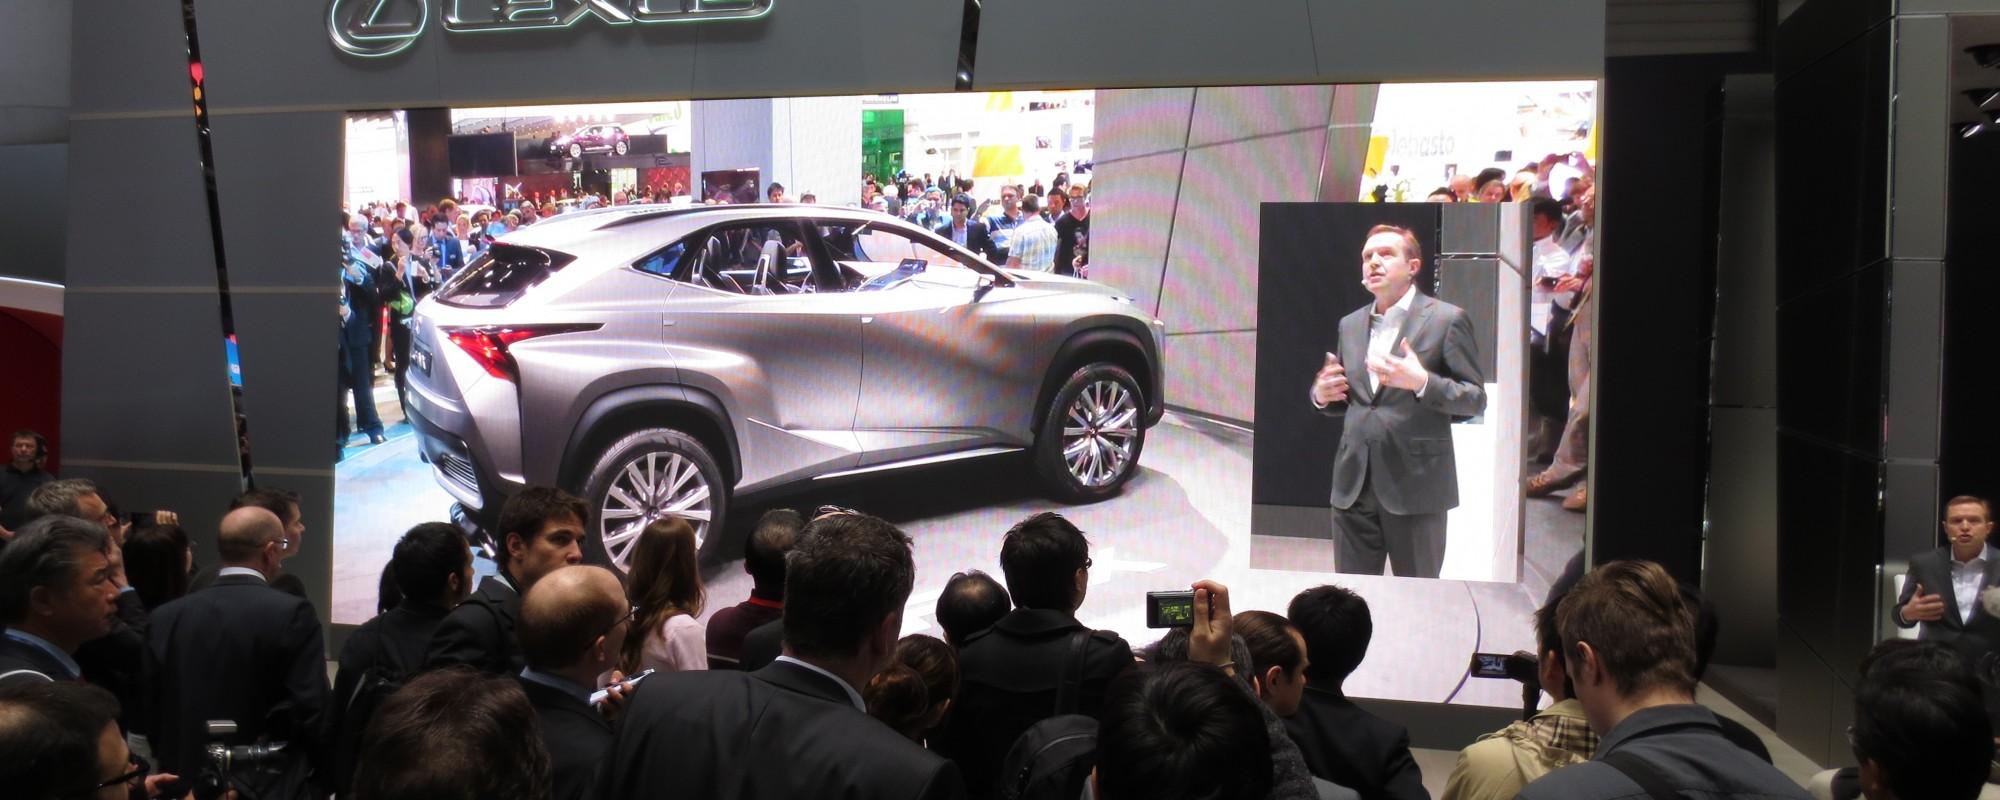 Lexus kondigt onthulling Lexus NX aan